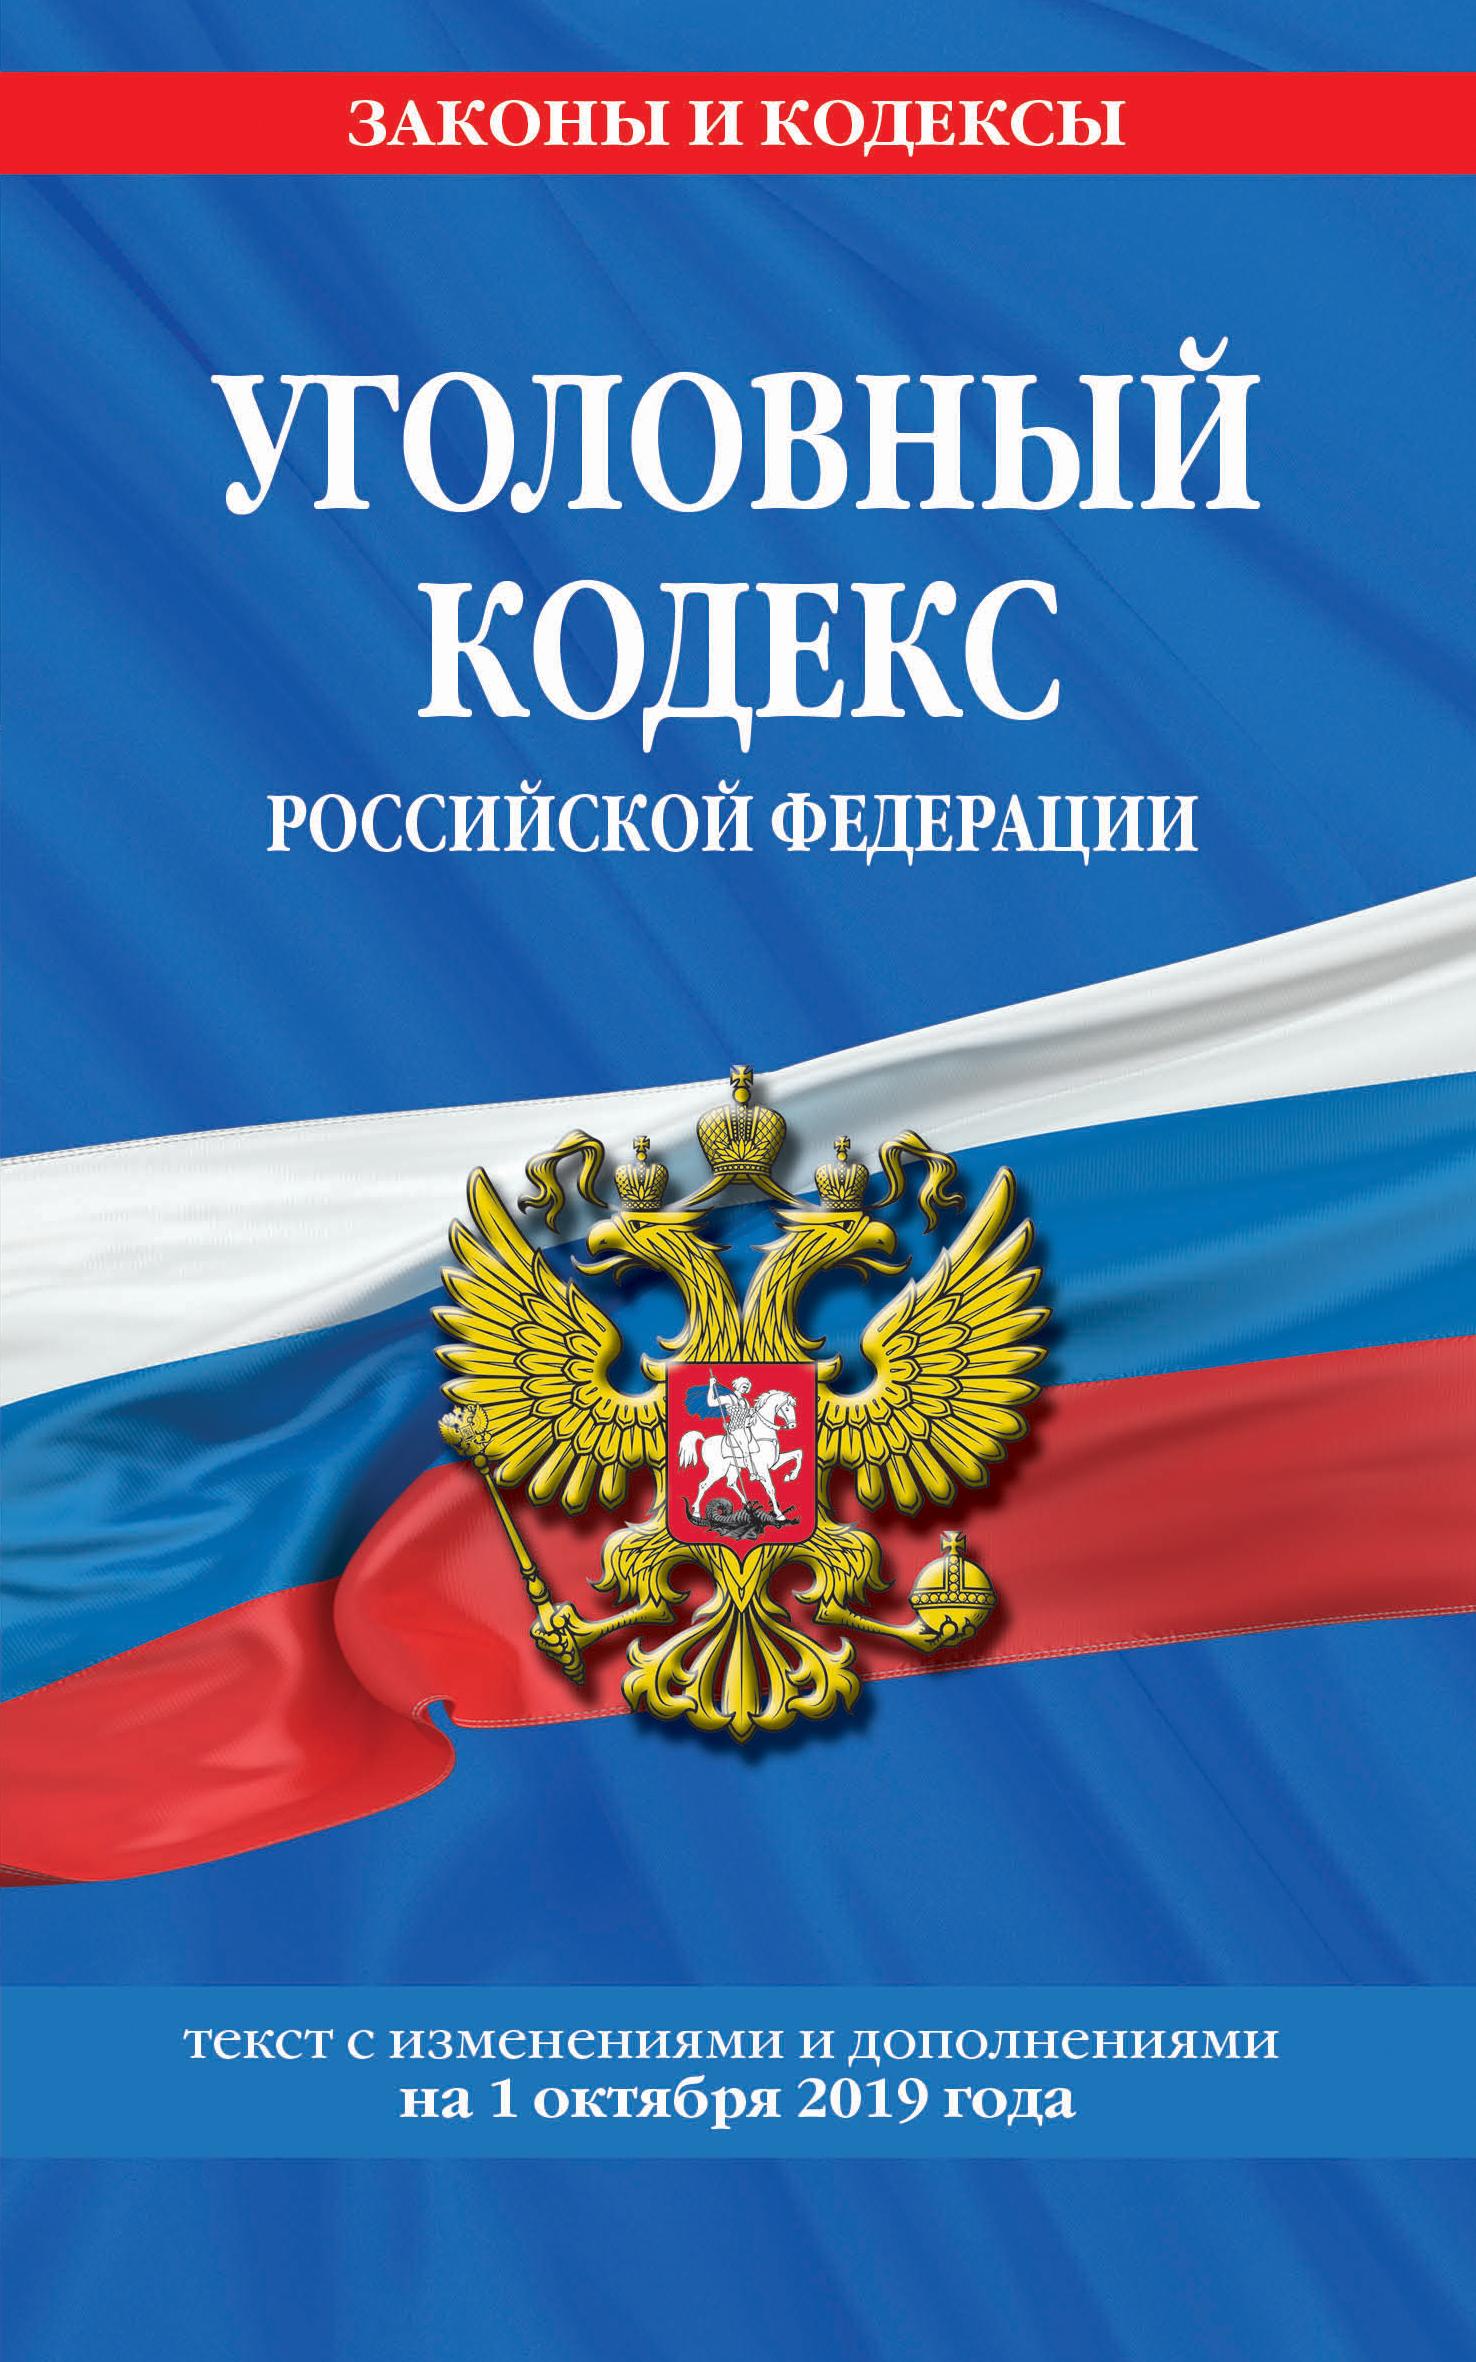 Ugolovnyj kodeks Rossijskoj Federatsii: tekst s izm. i dop. na 1 oktjabrja 2019 goda